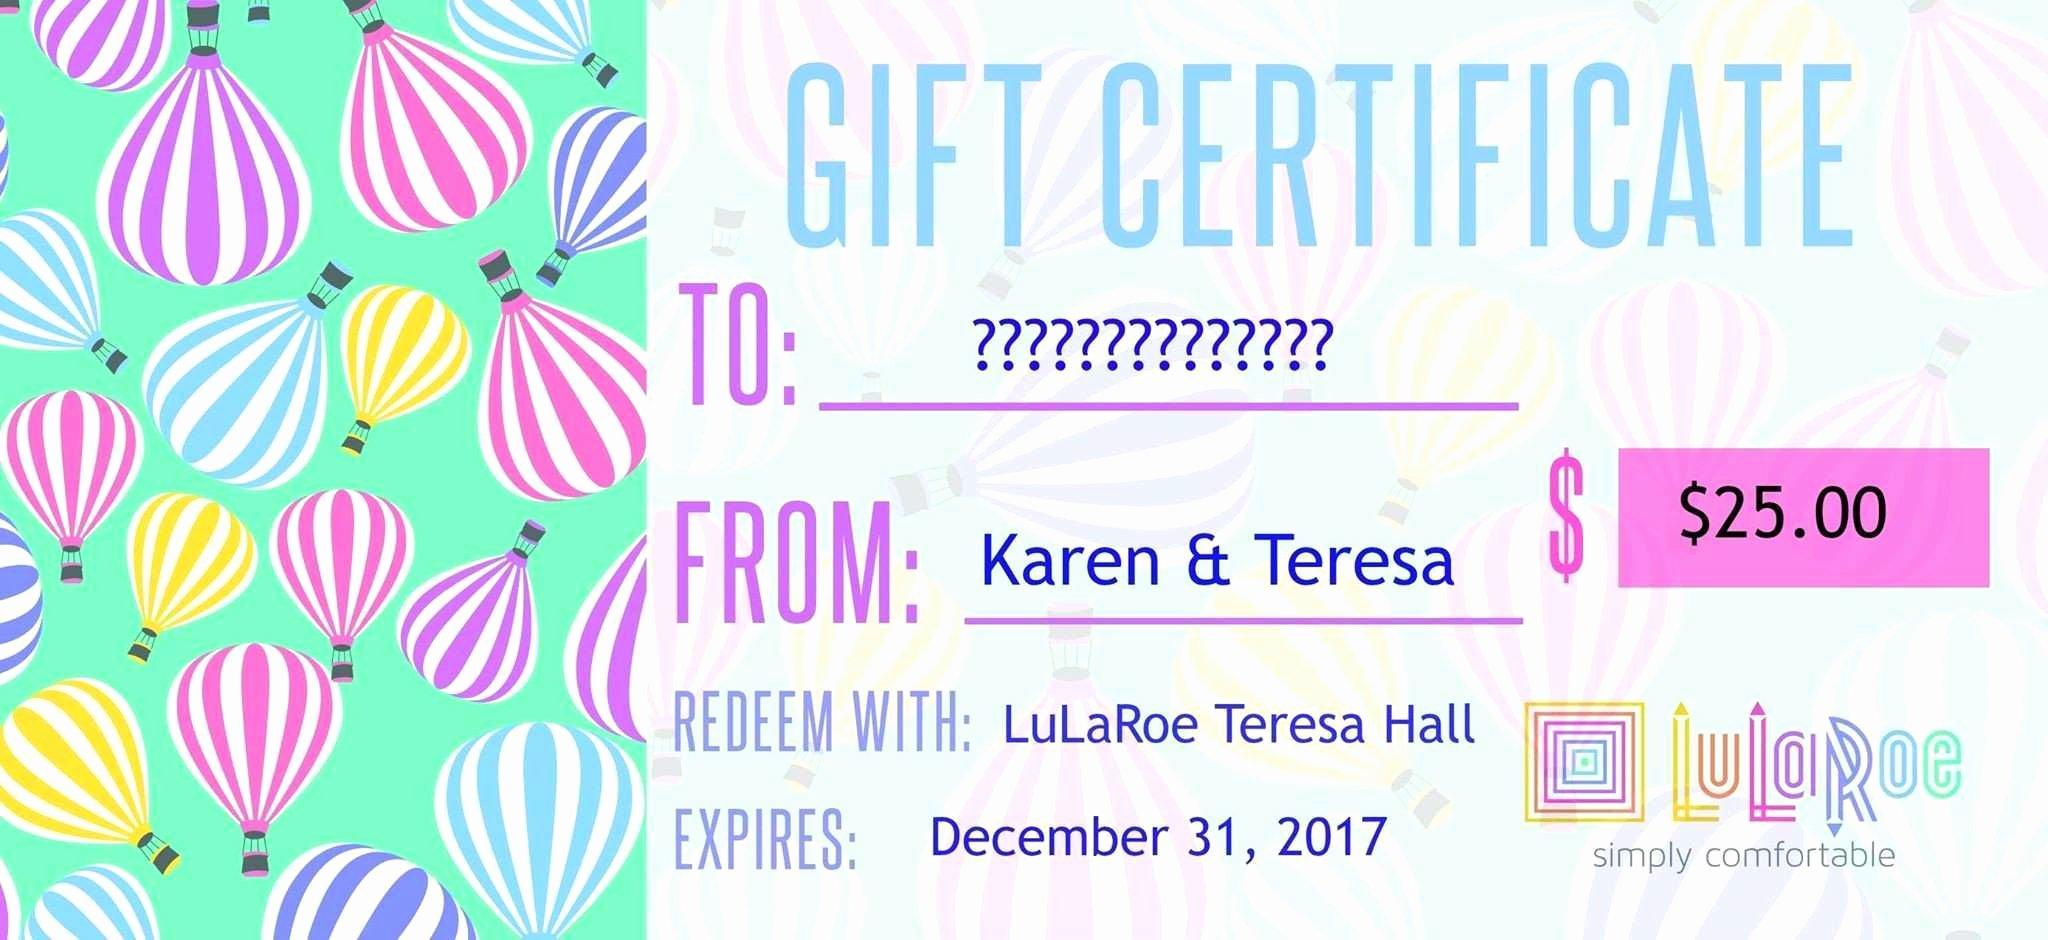 Lularoe Gift Certificate Beautiful Lularoe T Certificate